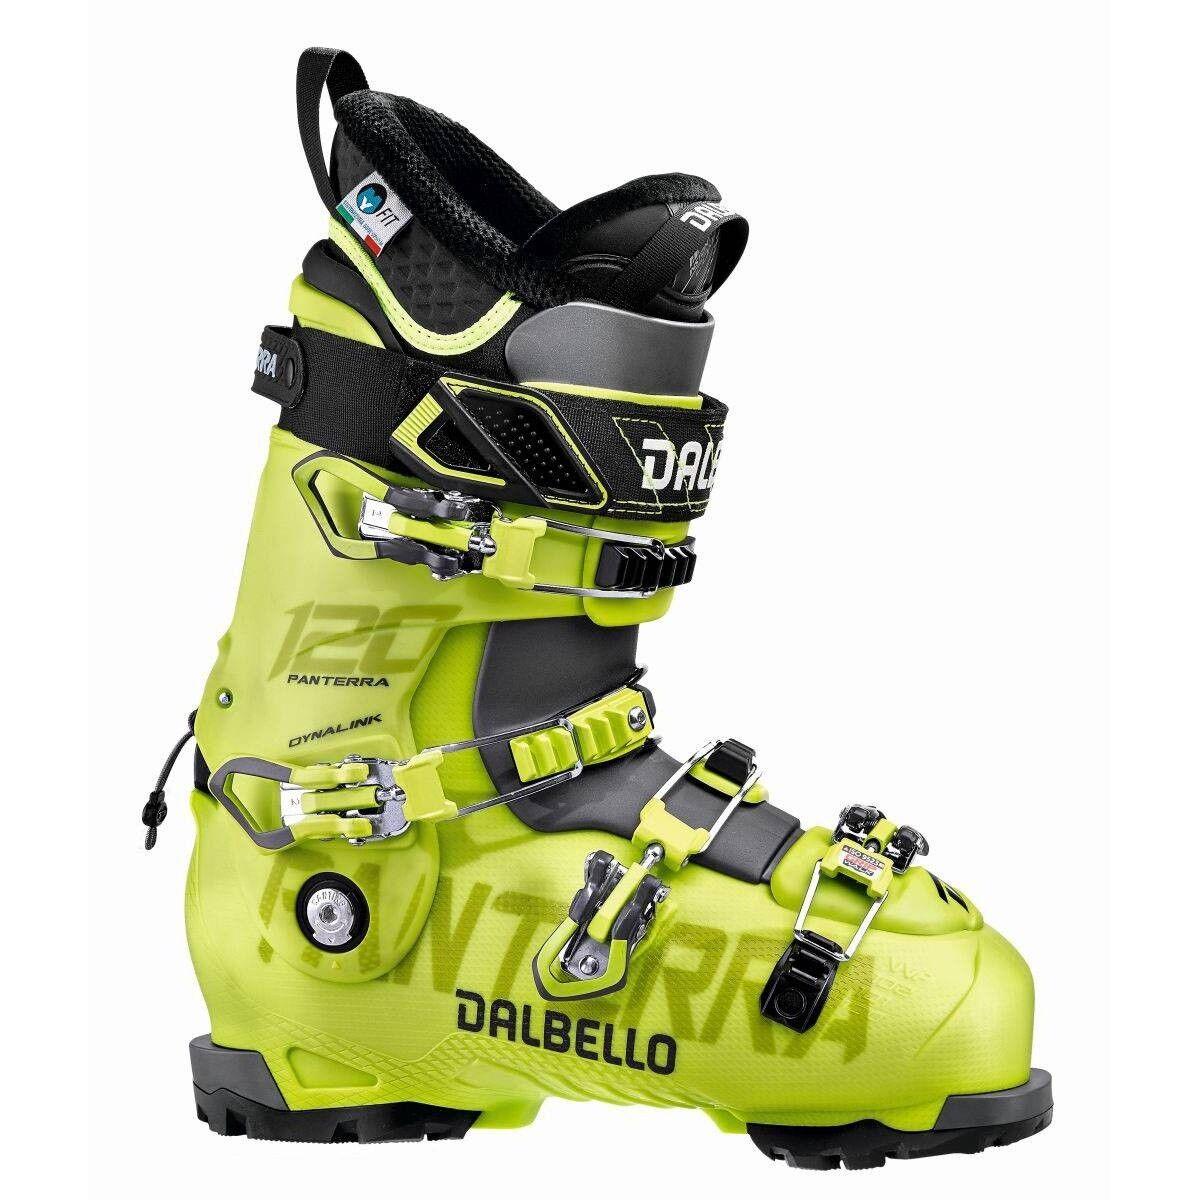 Dalbello Panterra 120 MS Skischuhe gelb